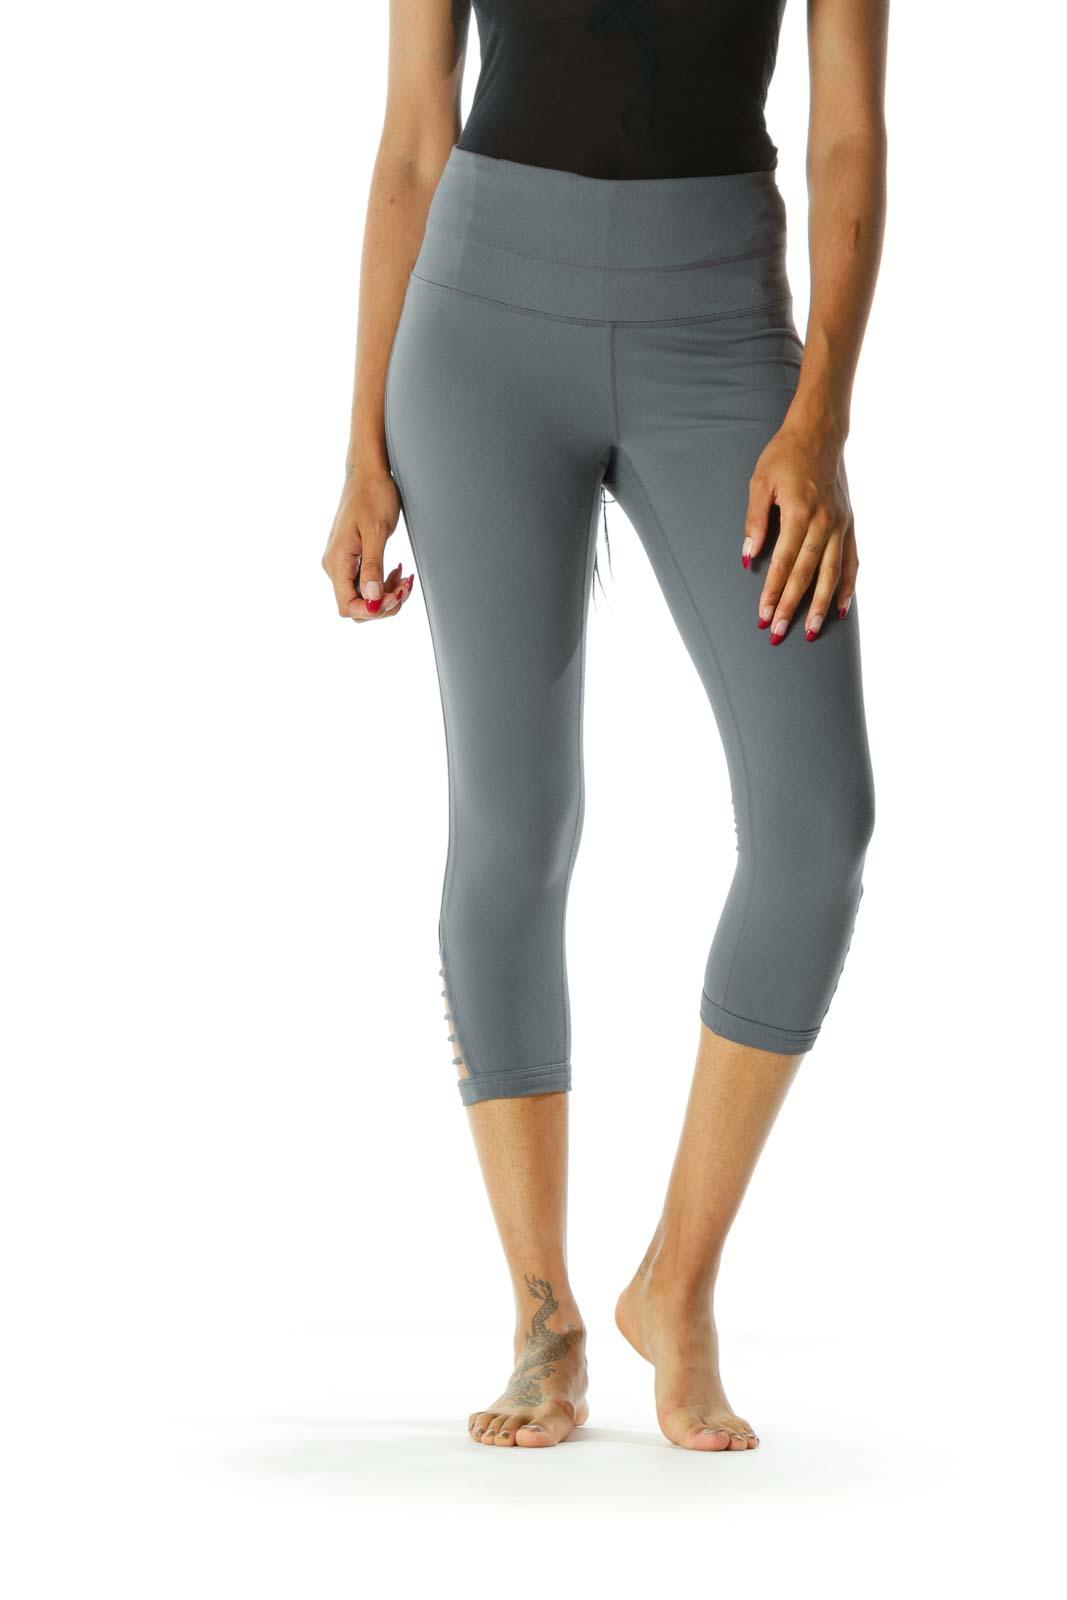 Gray Side-Detailed Cropped Legging